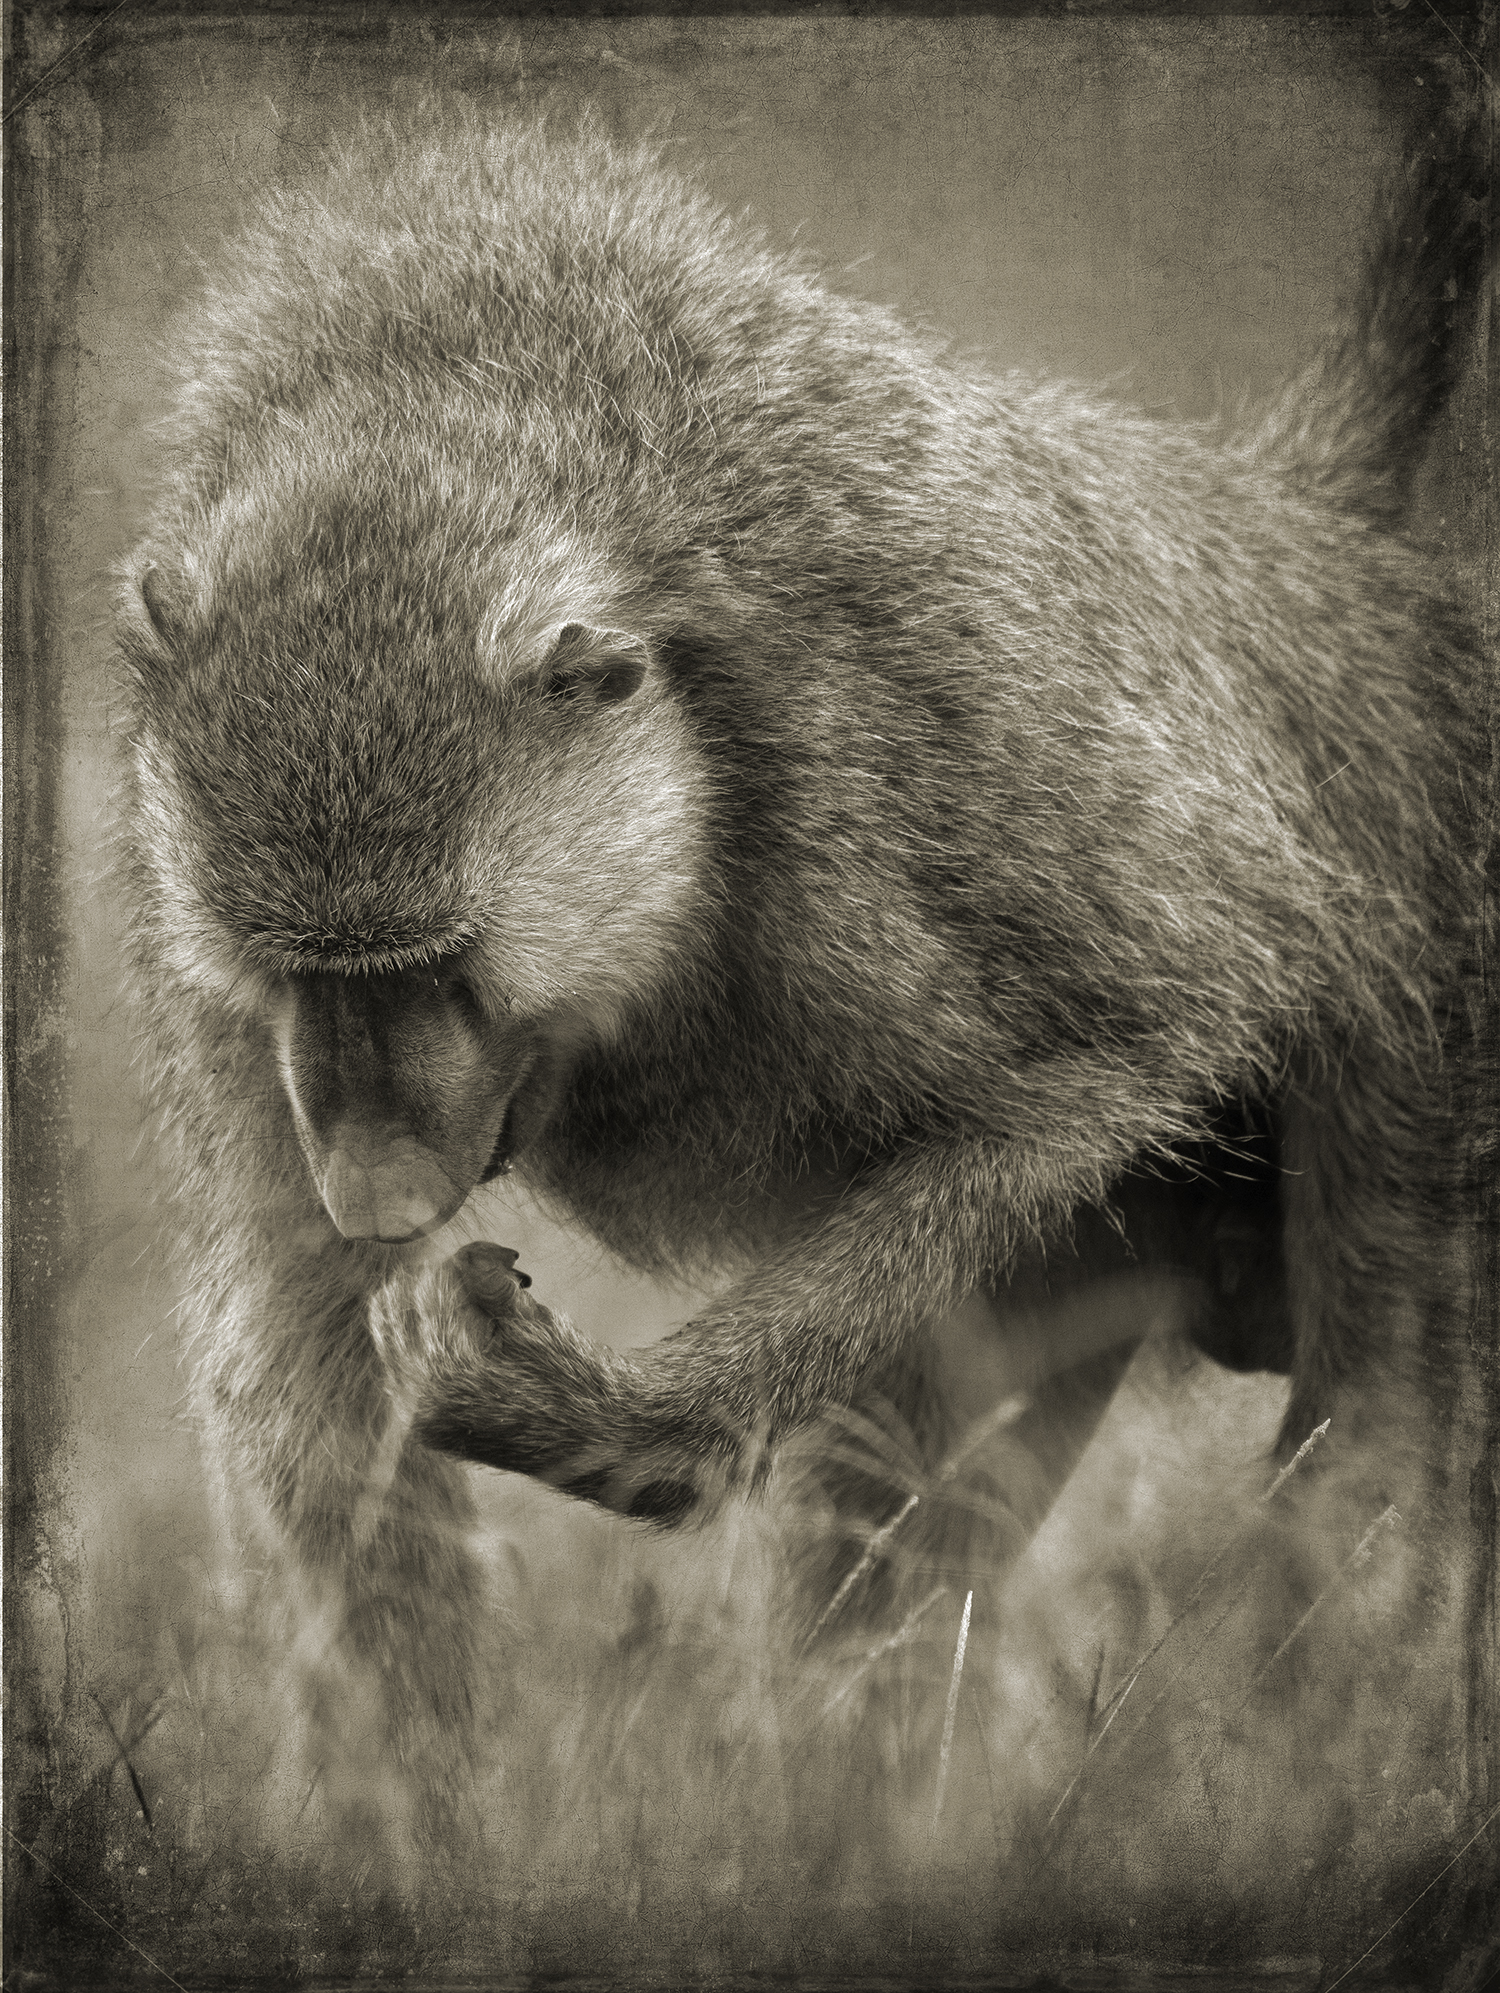 Baboon Eating Grass copy.jpg